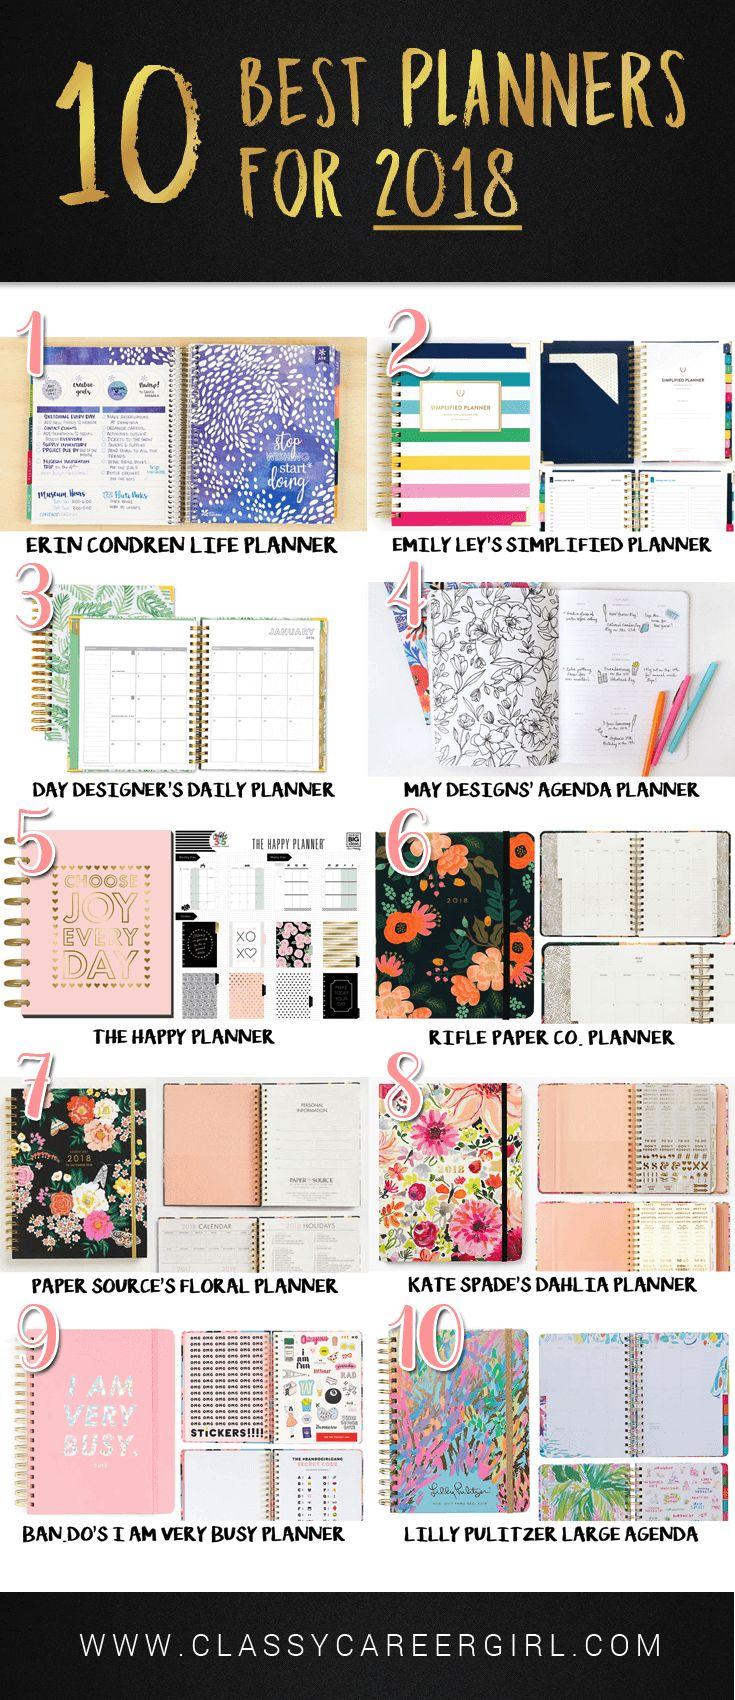 3515 best planners bullet journals images on pinterest free printables planner ideas and. Black Bedroom Furniture Sets. Home Design Ideas